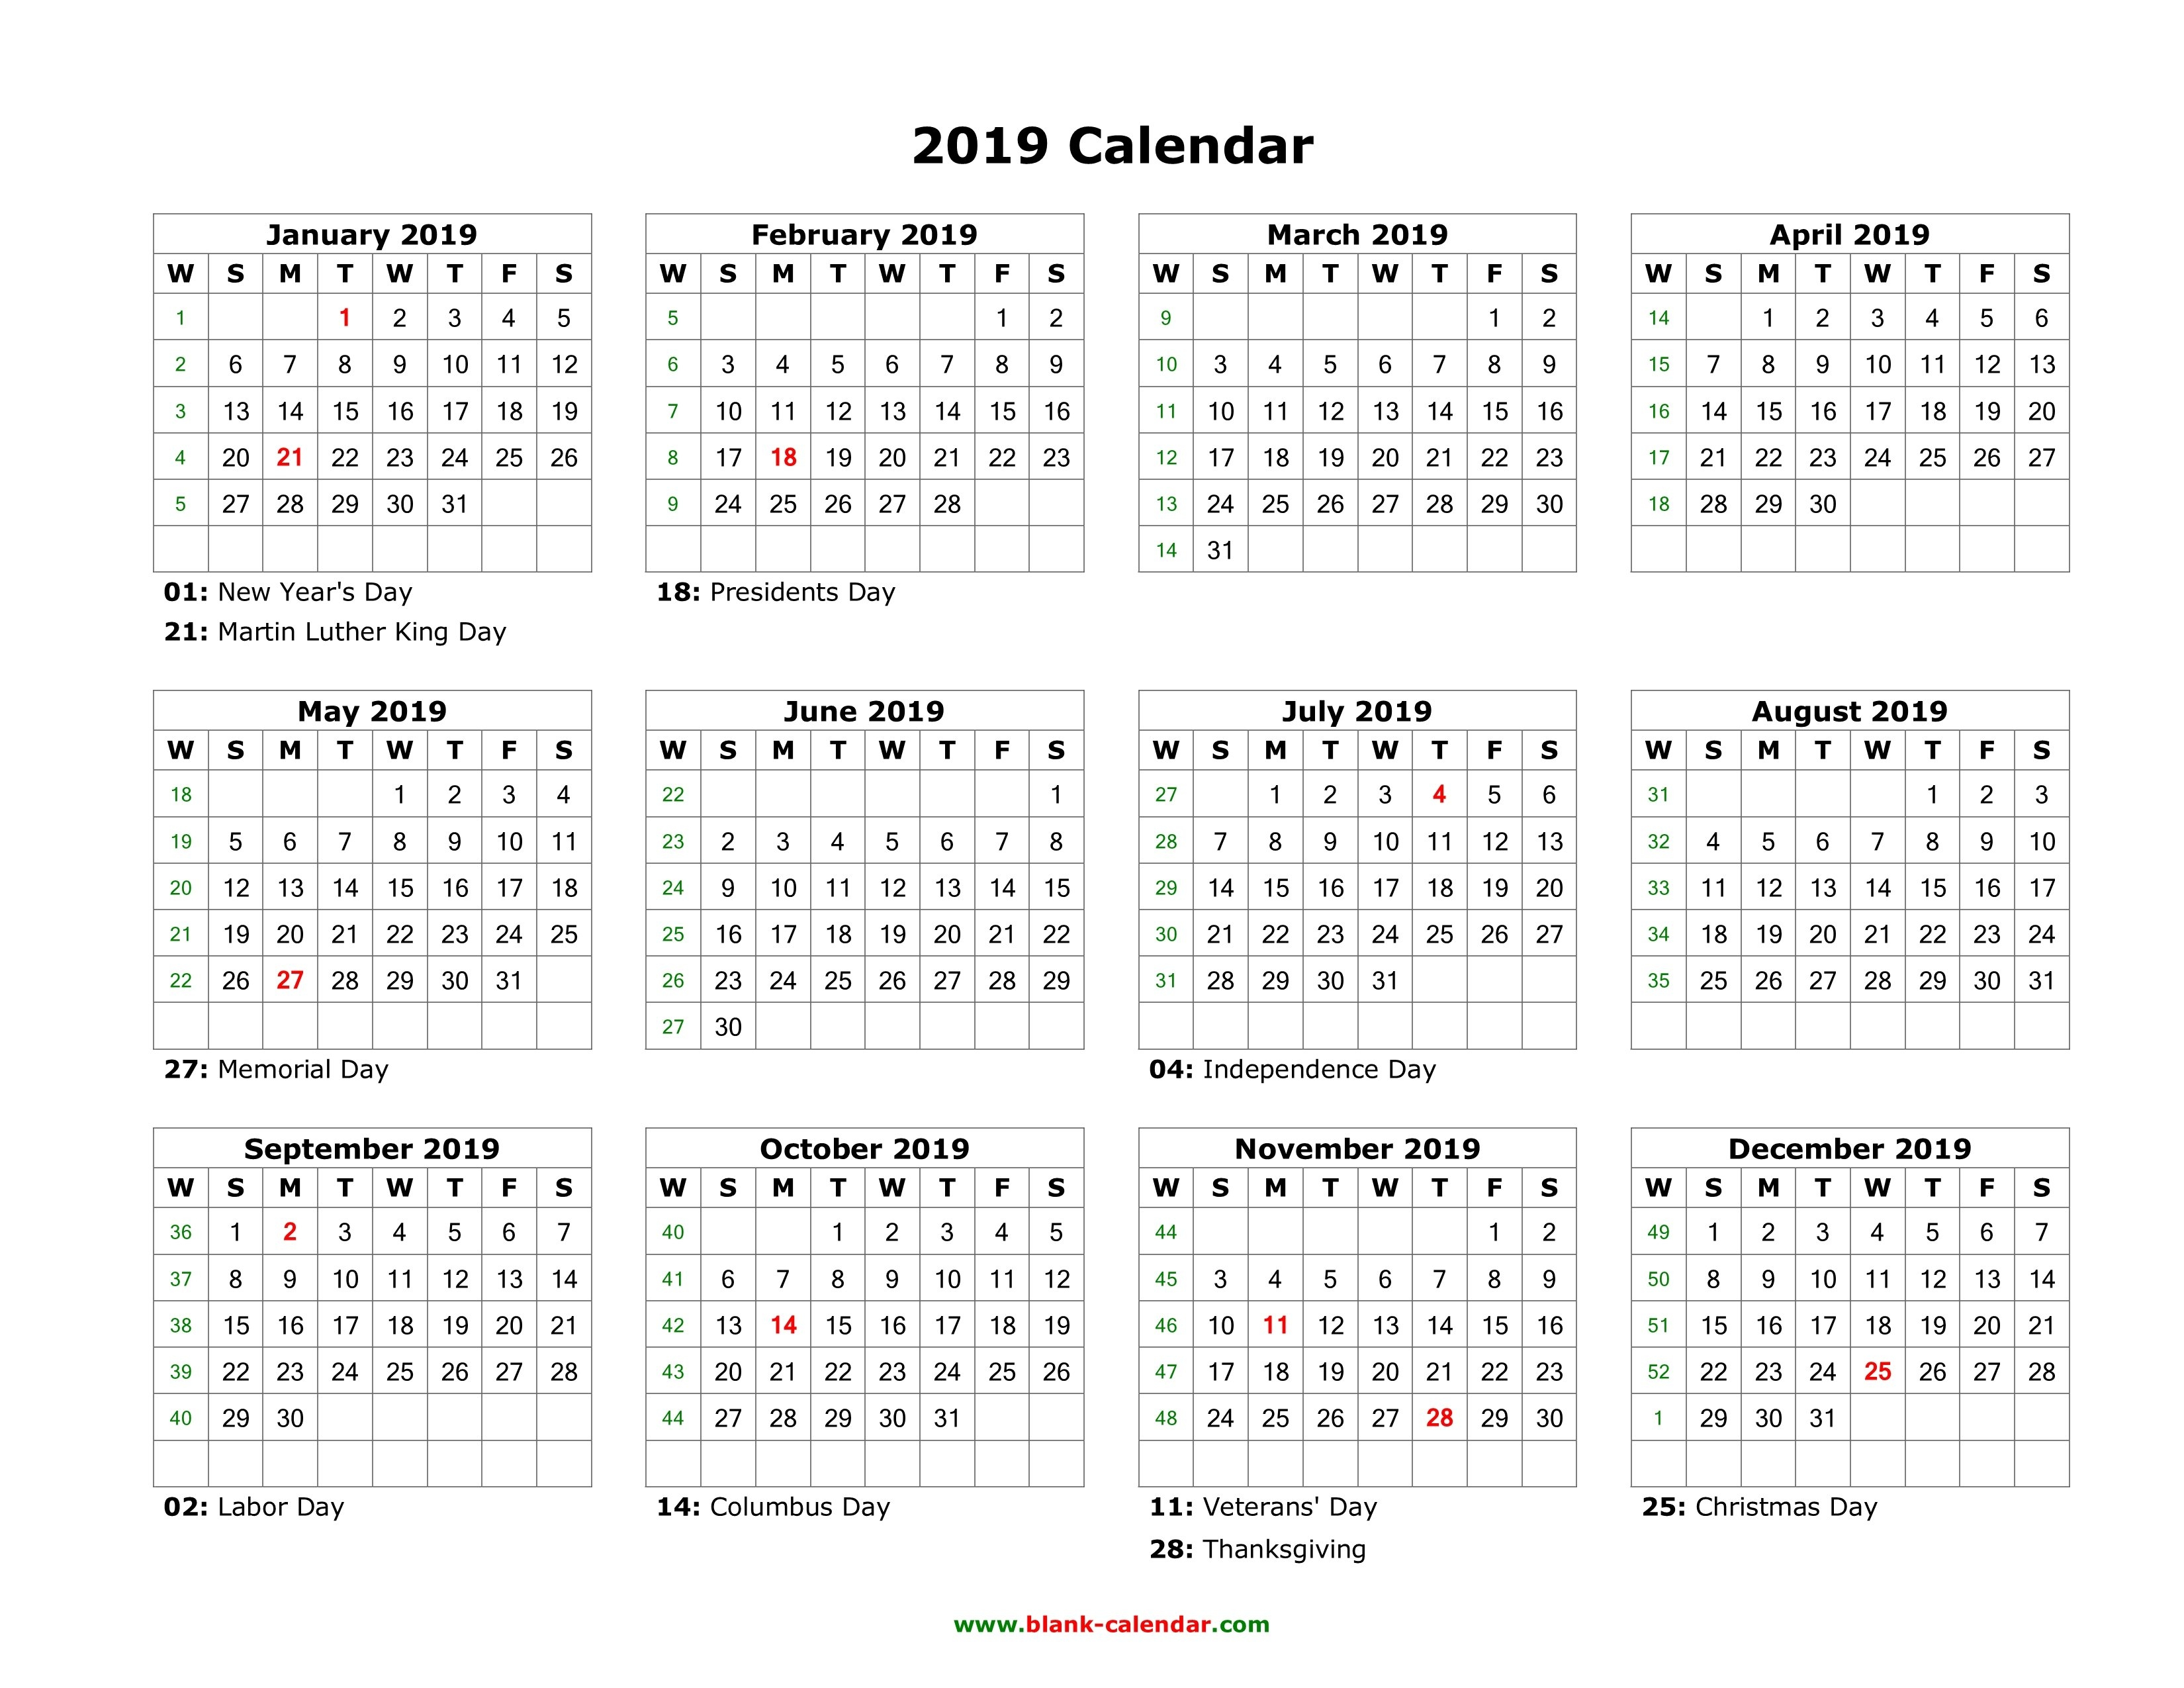 Blank Calendar 2019 | Free Download Calendar Templates Calendar 2019 Print Free